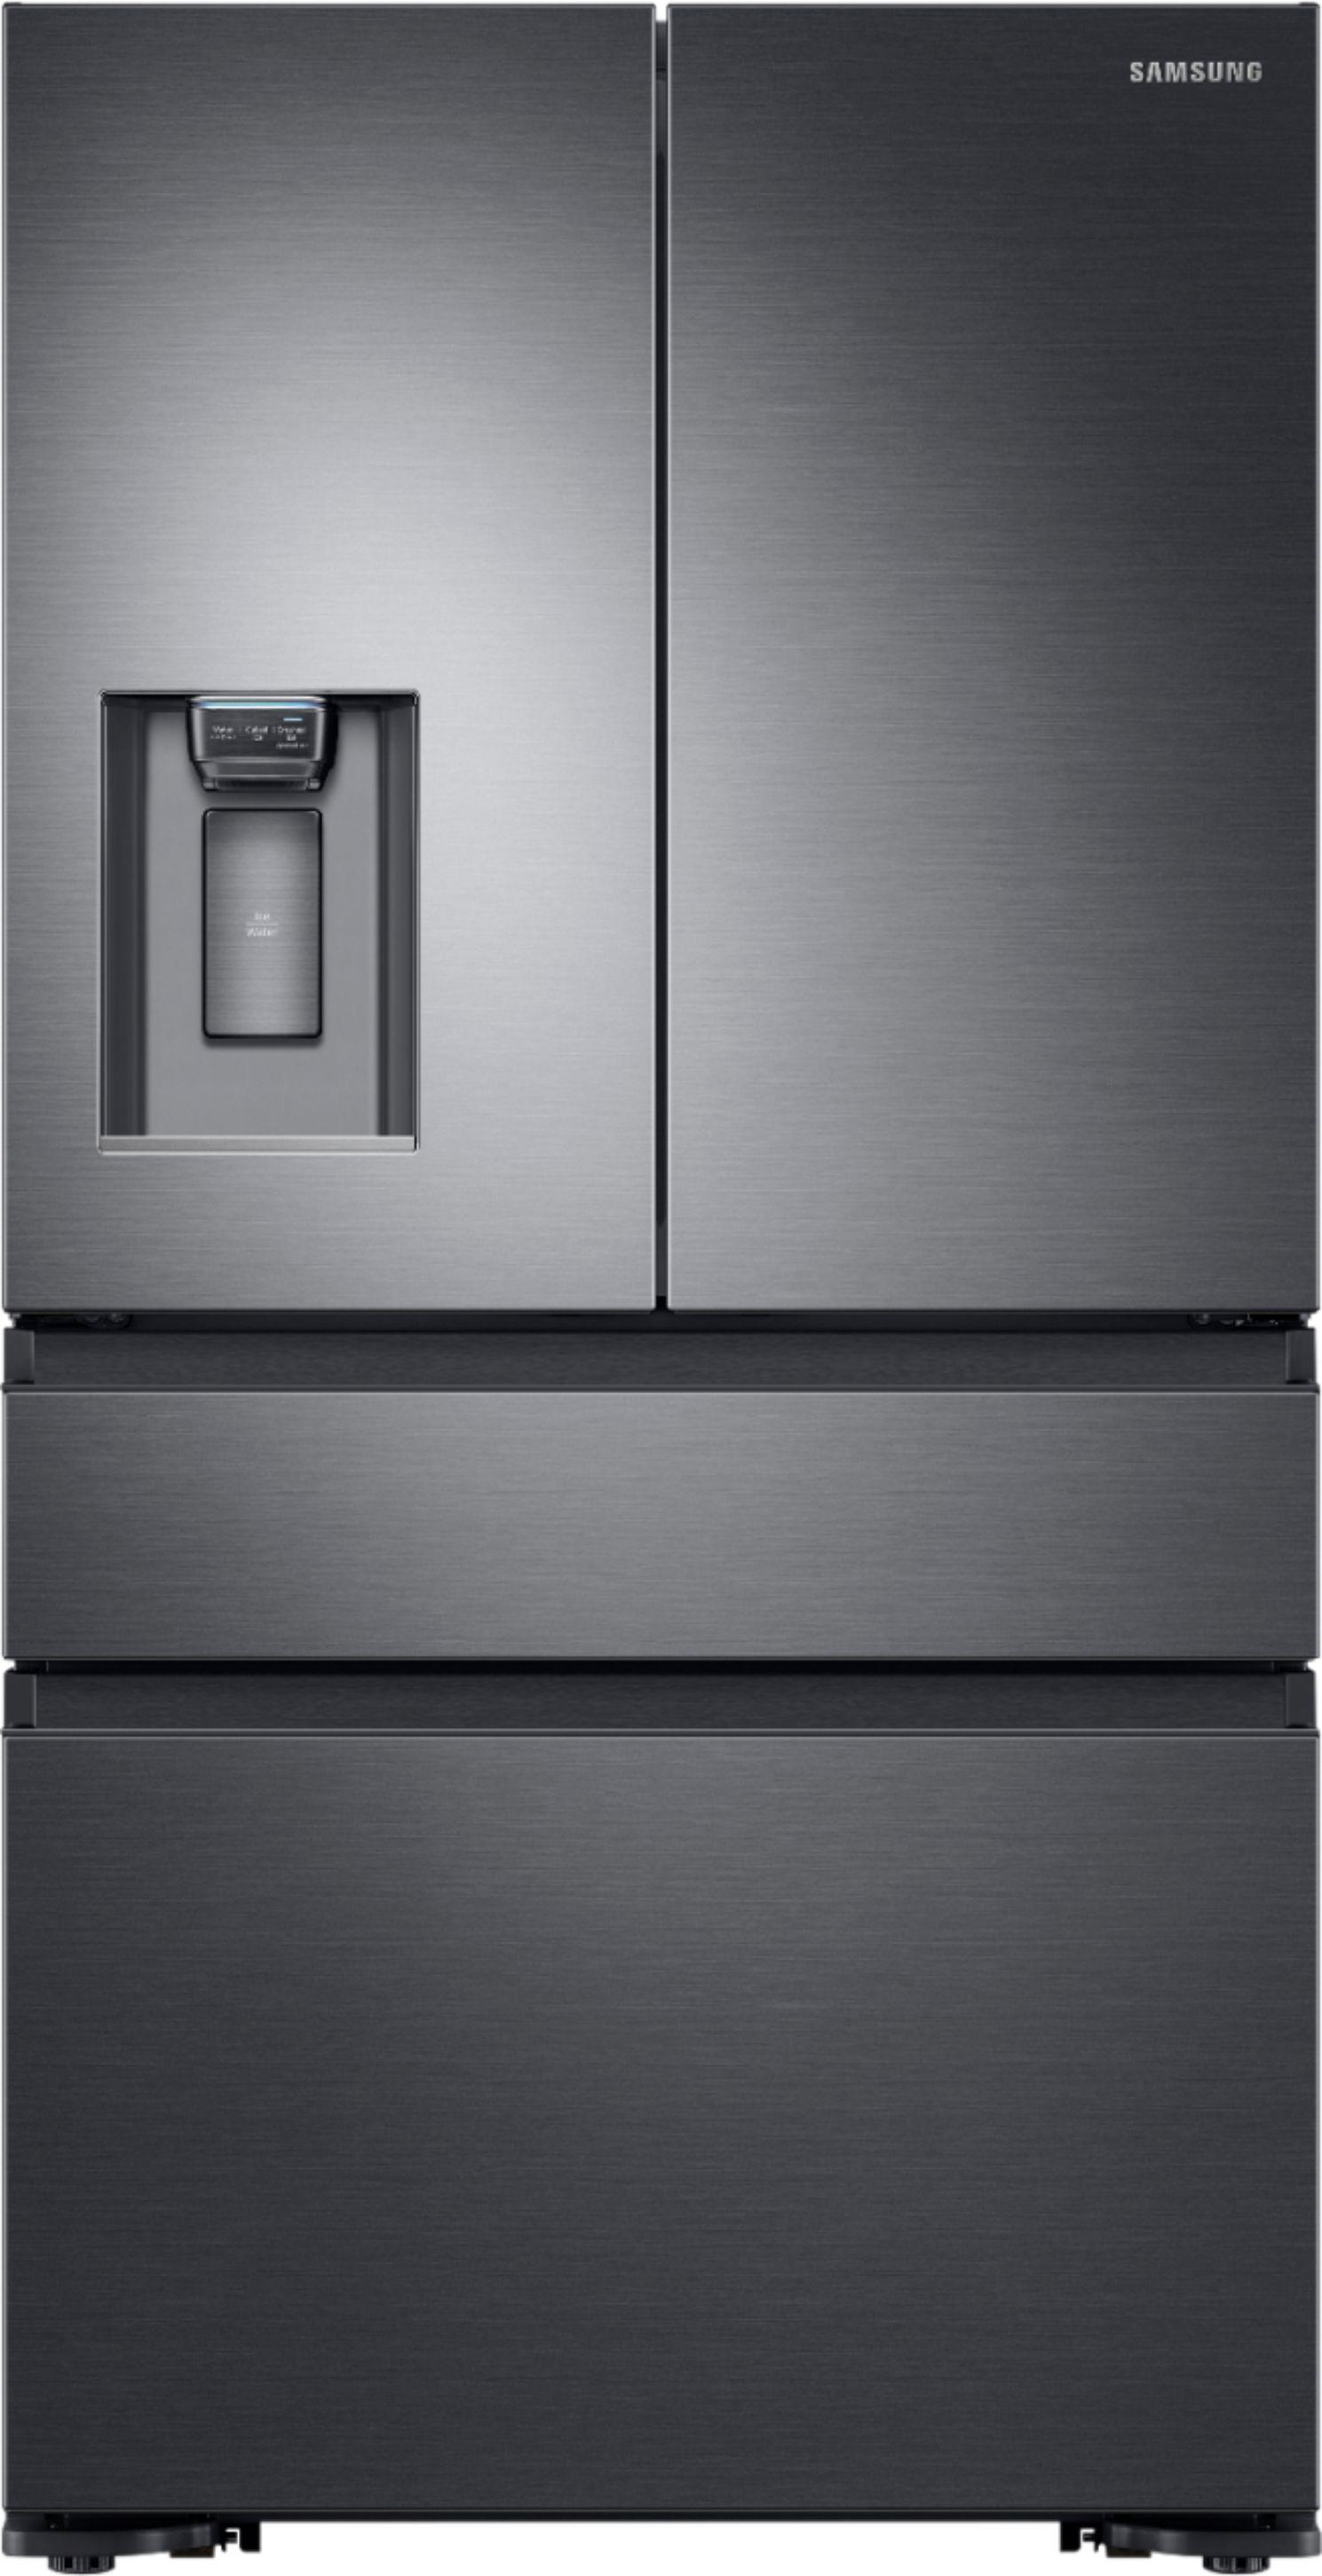 Samsung 22.7 Cu. Ft. 4-Door Flex French Door Counter-Depth Refrigerator Black stainless steel RF23M8070SG